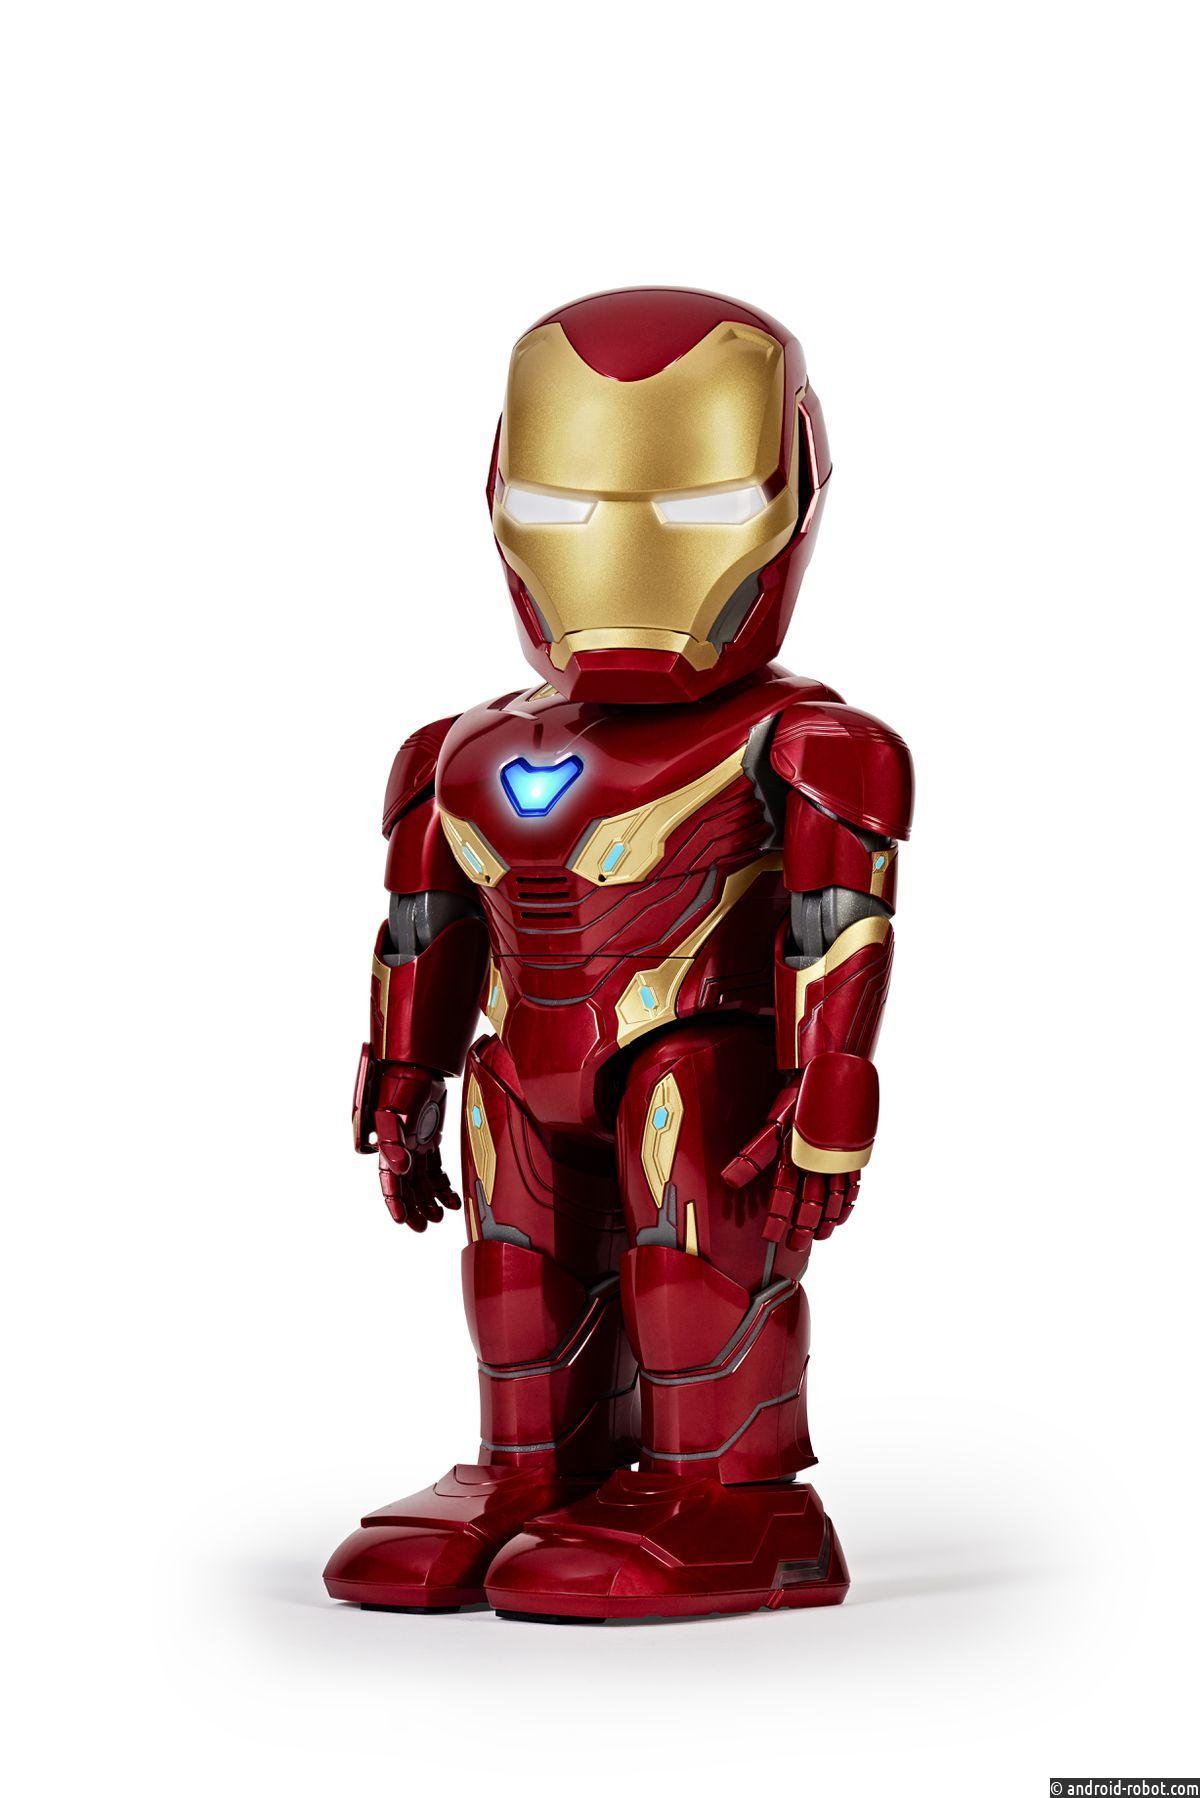 Создан робот Iron Man, патрулирующий нашу комнату